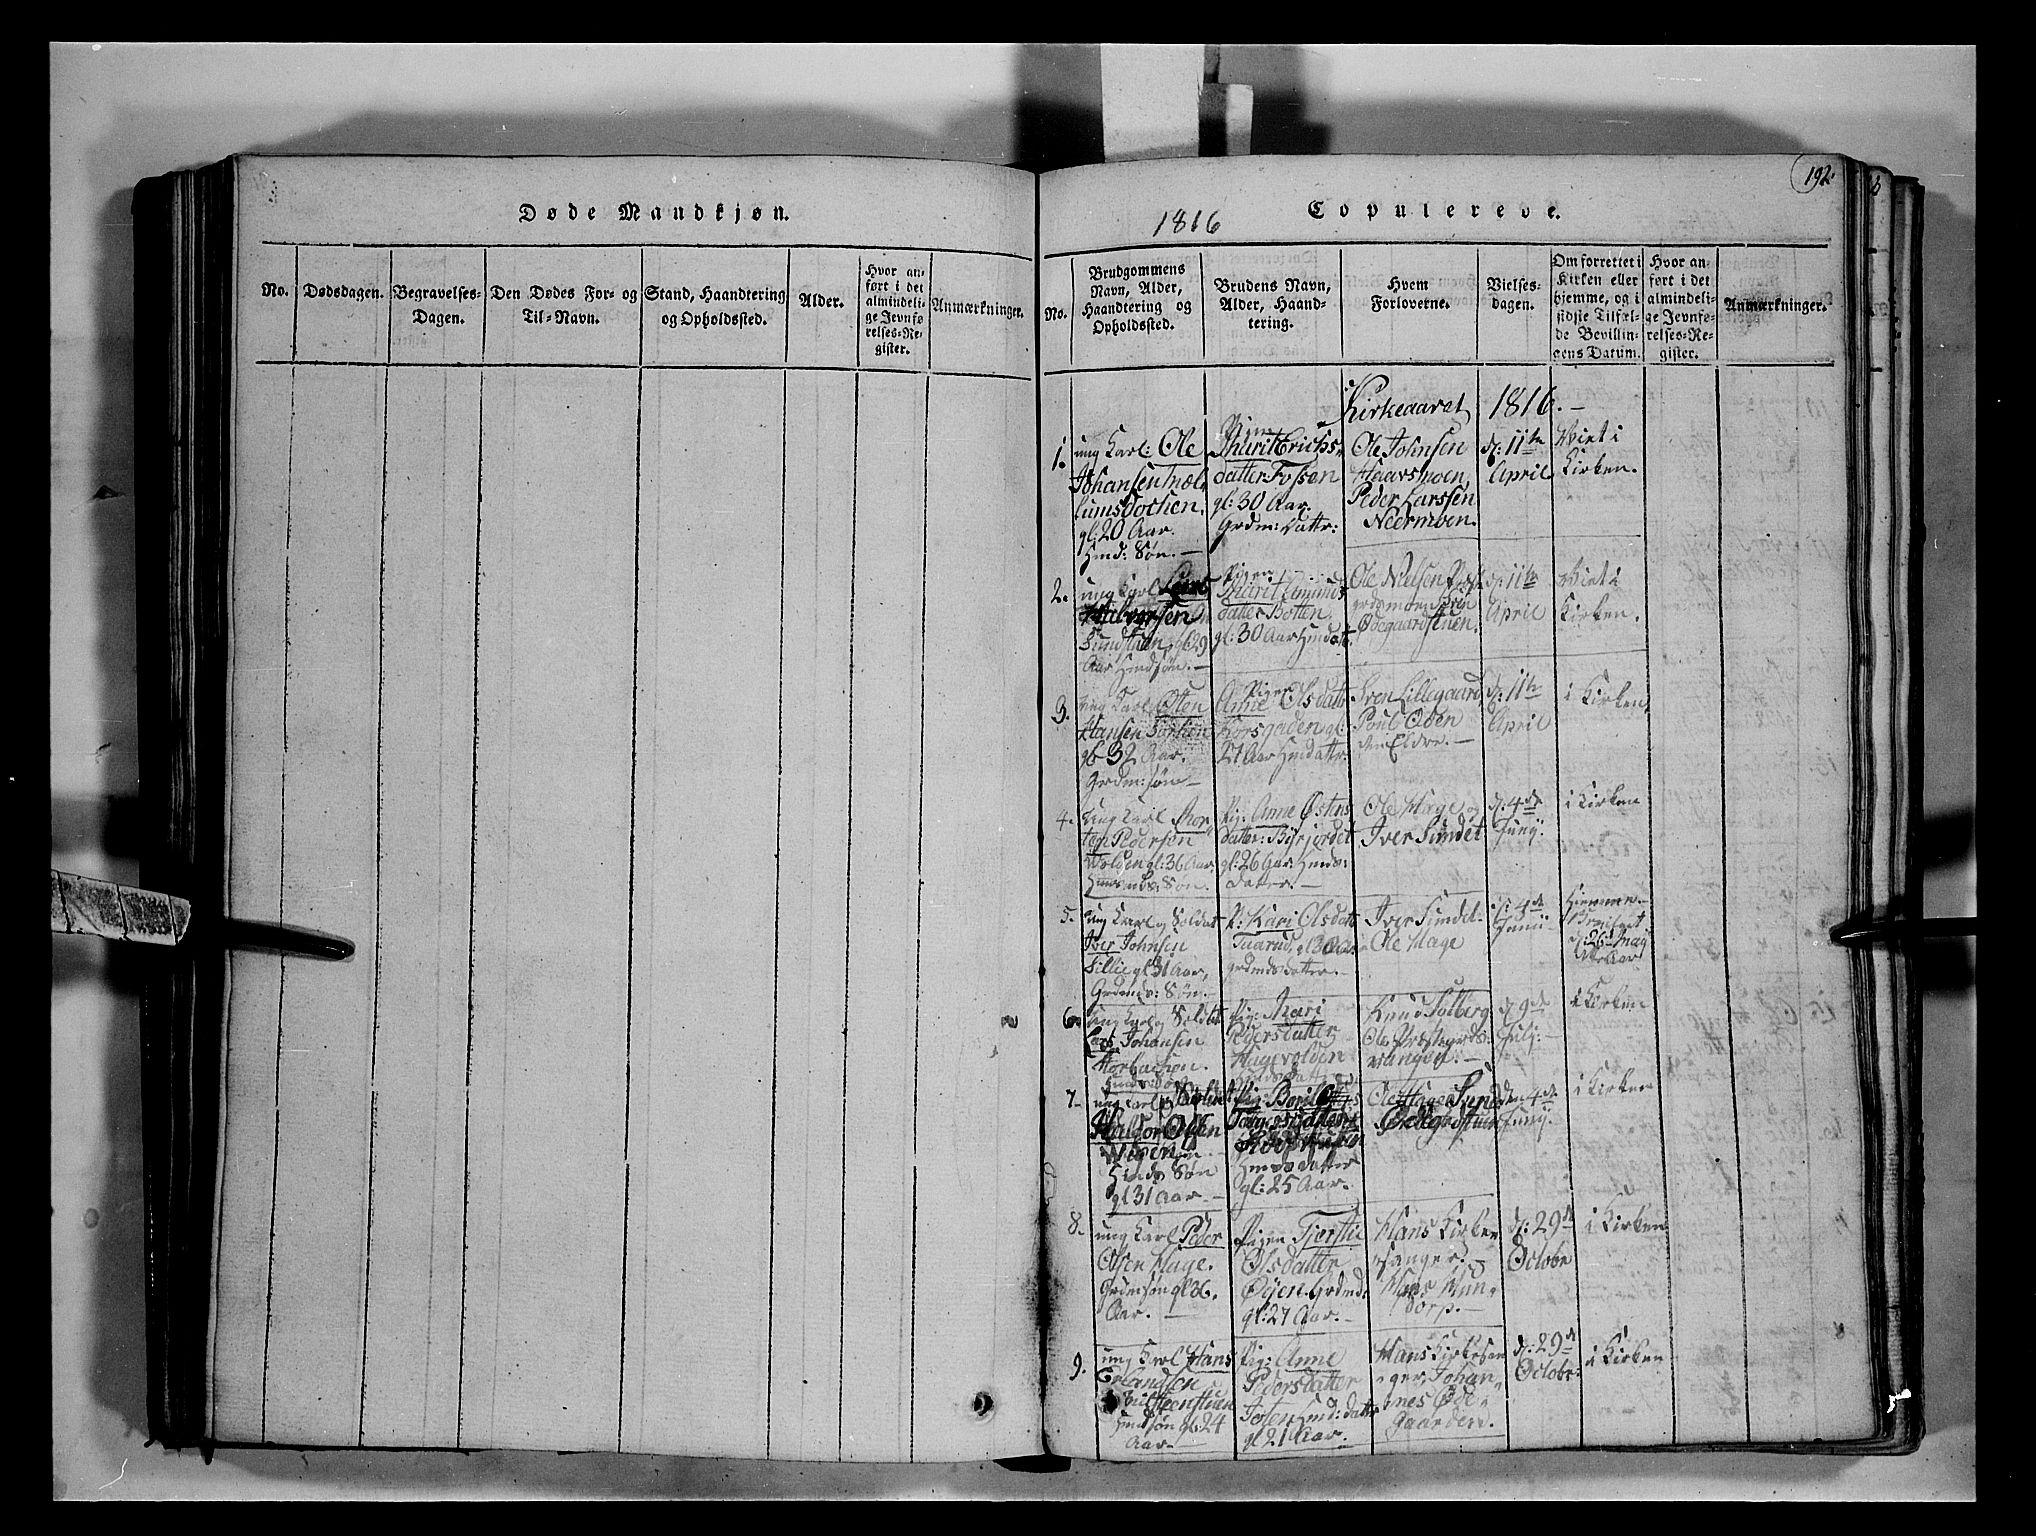 SAH, Fron prestekontor, H/Ha/Hab/L0004: Klokkerbok nr. 4, 1816-1850, s. 192